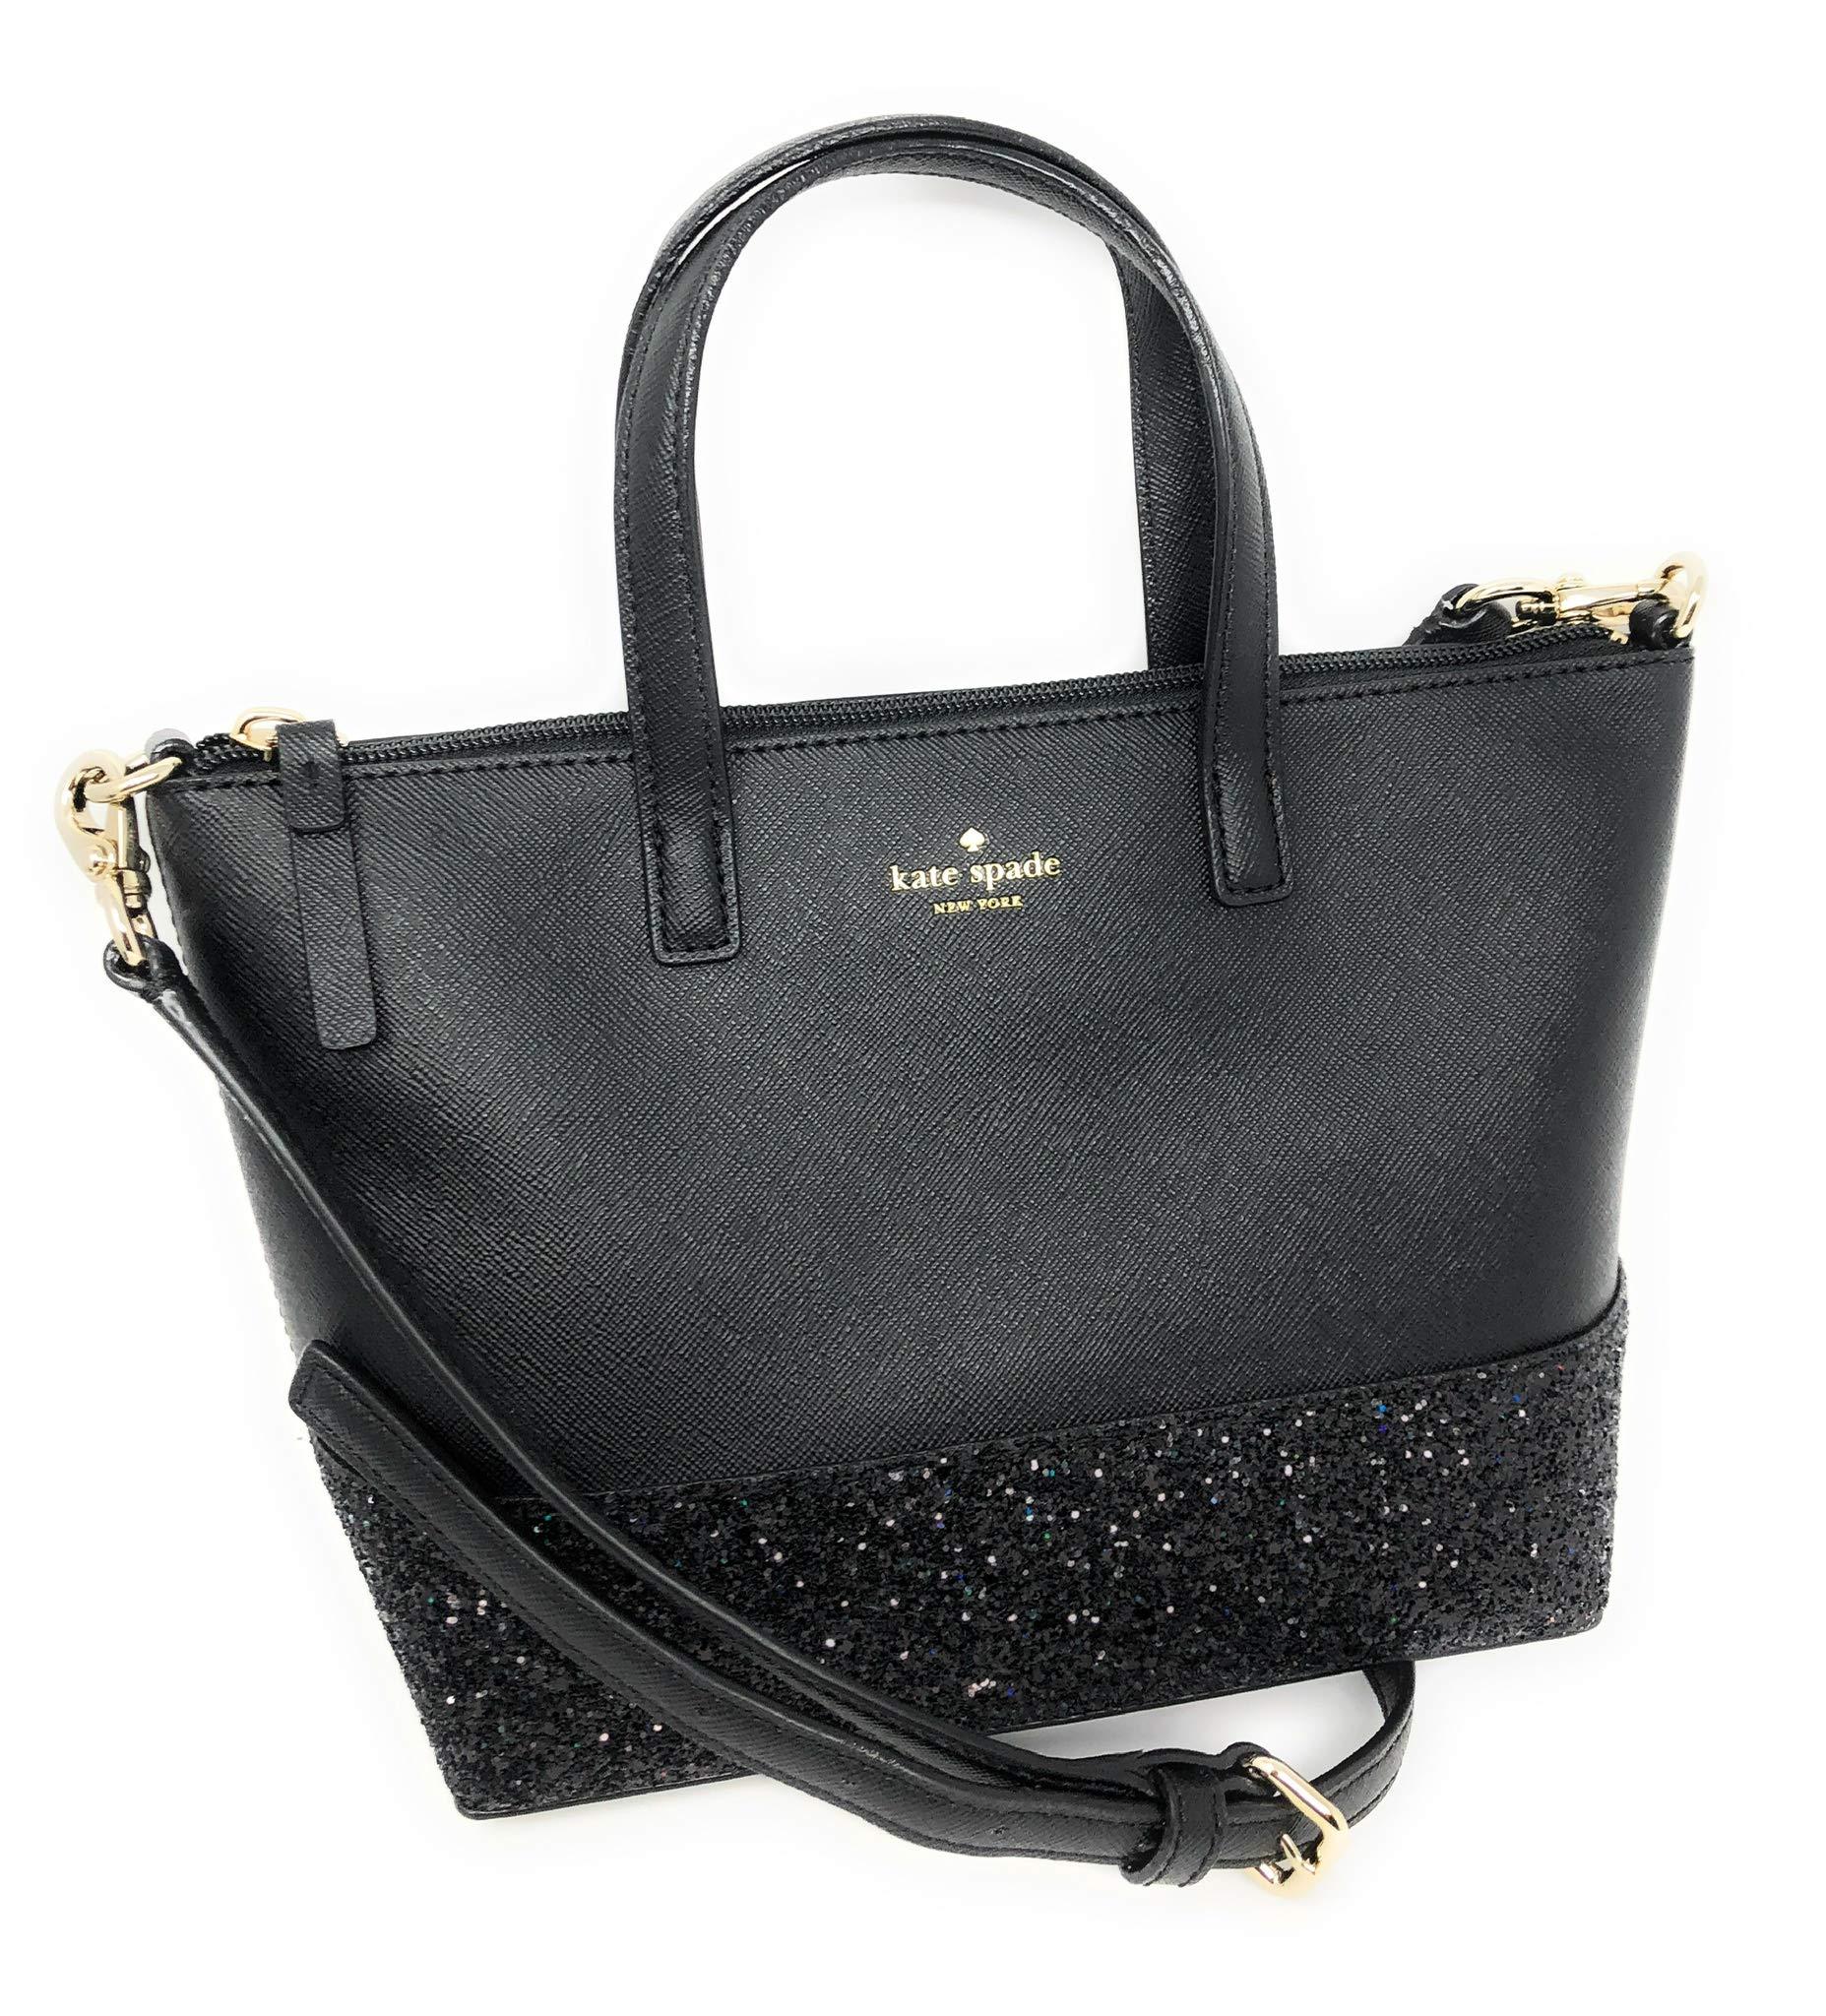 Kate Spade New York Ina Greta Court Glitter Crossbody Bag Top Handle Handbag (Black)